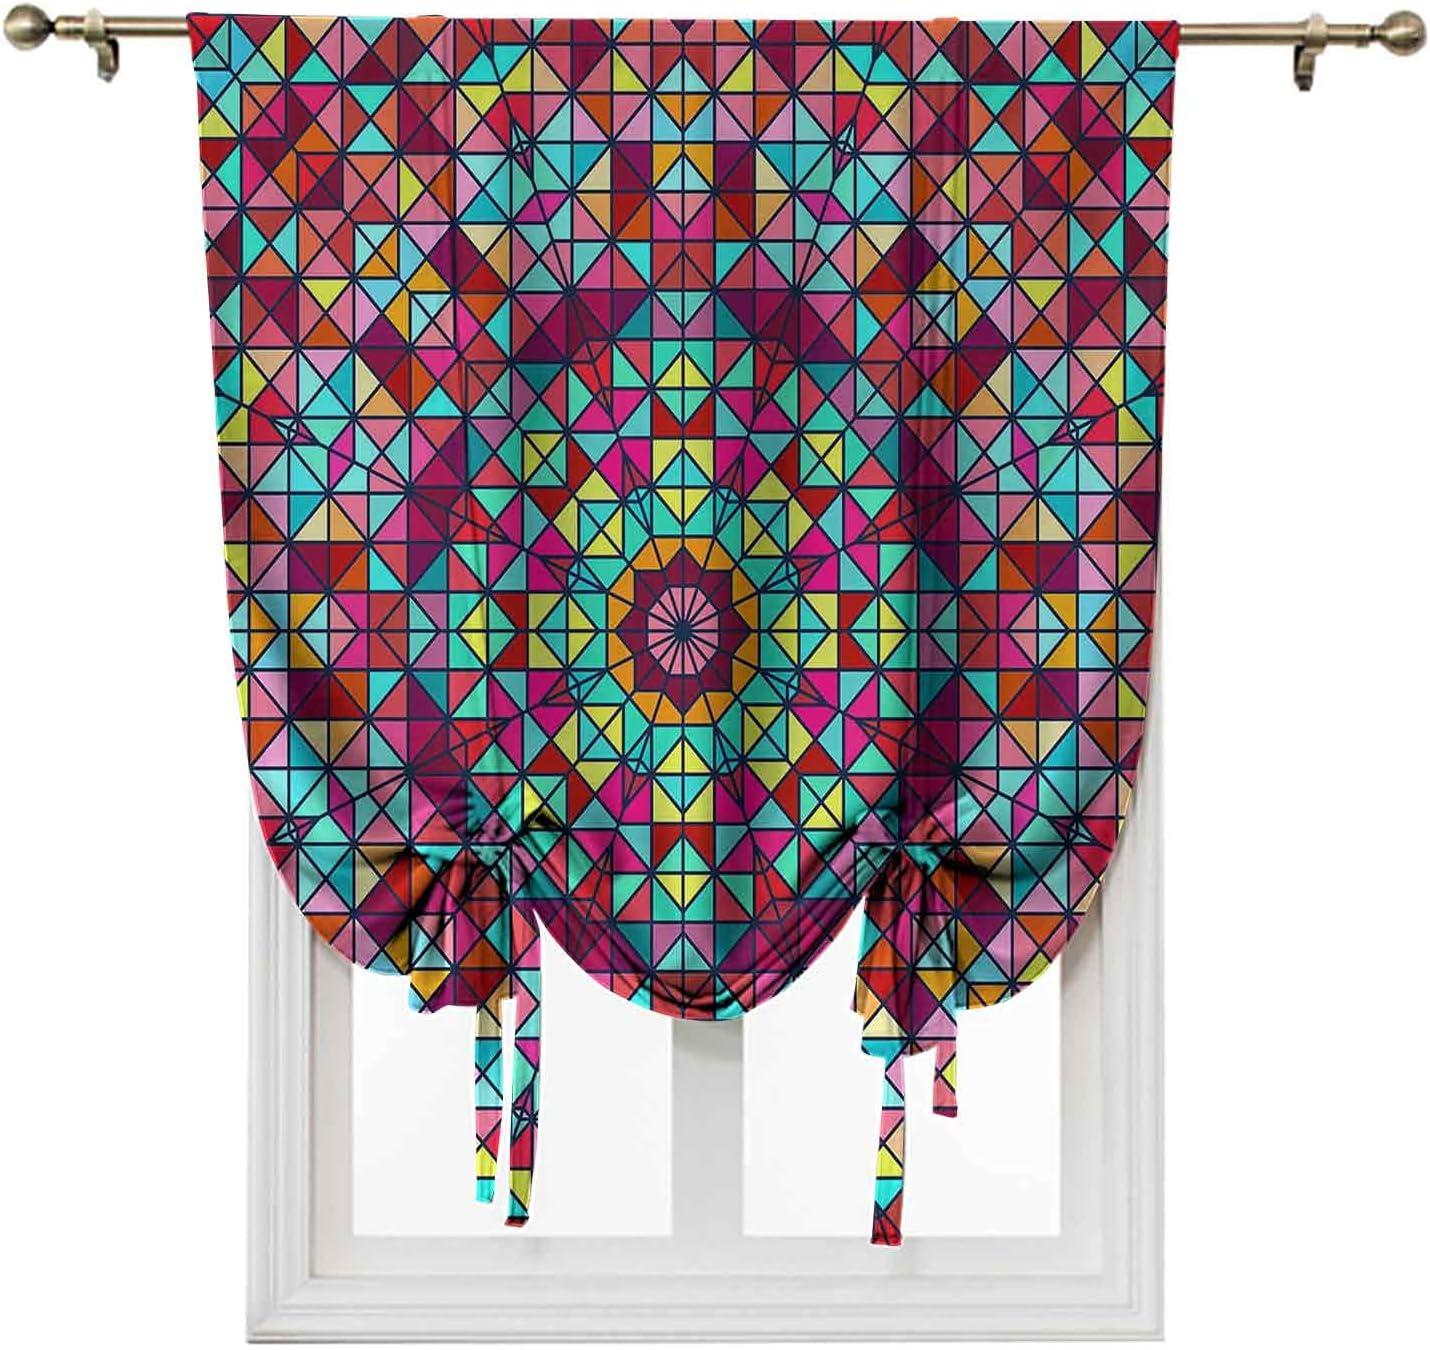 Farmhouse Curtains for Living Room x 63